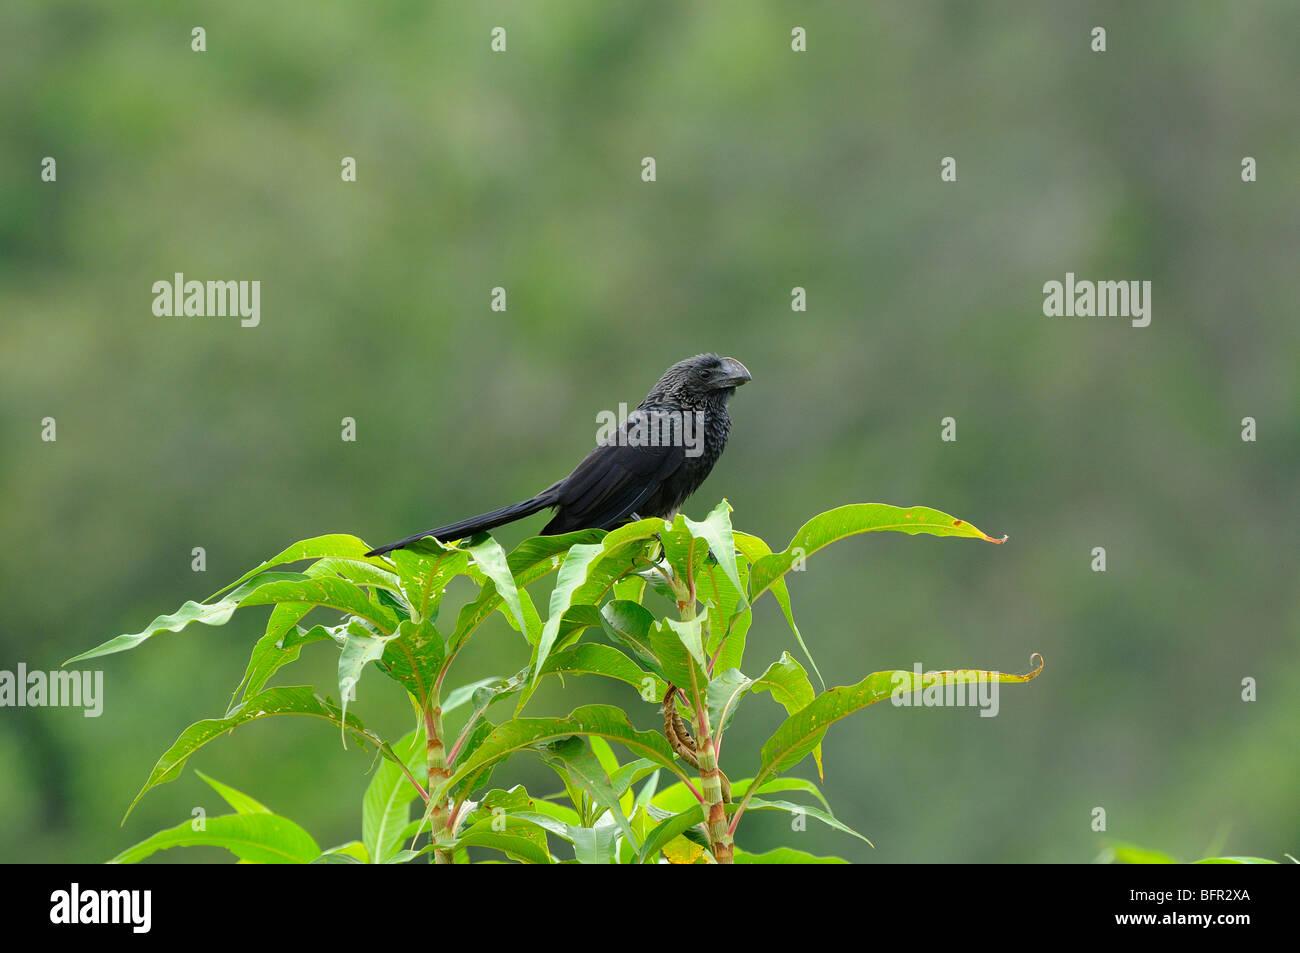 Smooth-billed Ani (Crotophaga ani) perched on top of bush, Pantanal, Brazil. - Stock Image